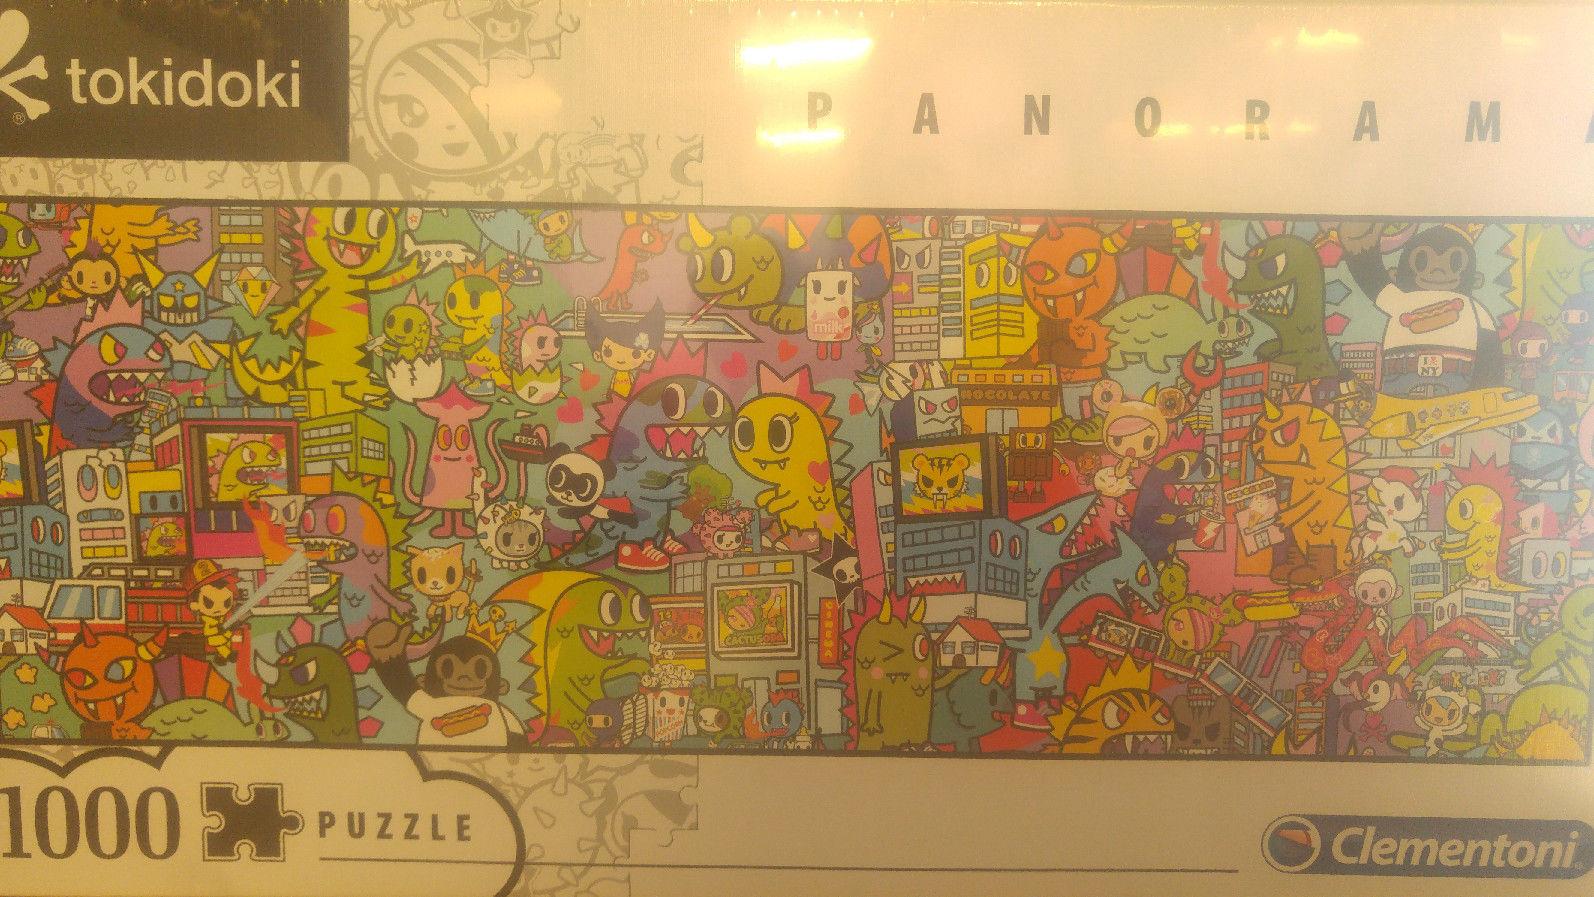 Puzzle Clementoni 1000 - Tokidoki panorama